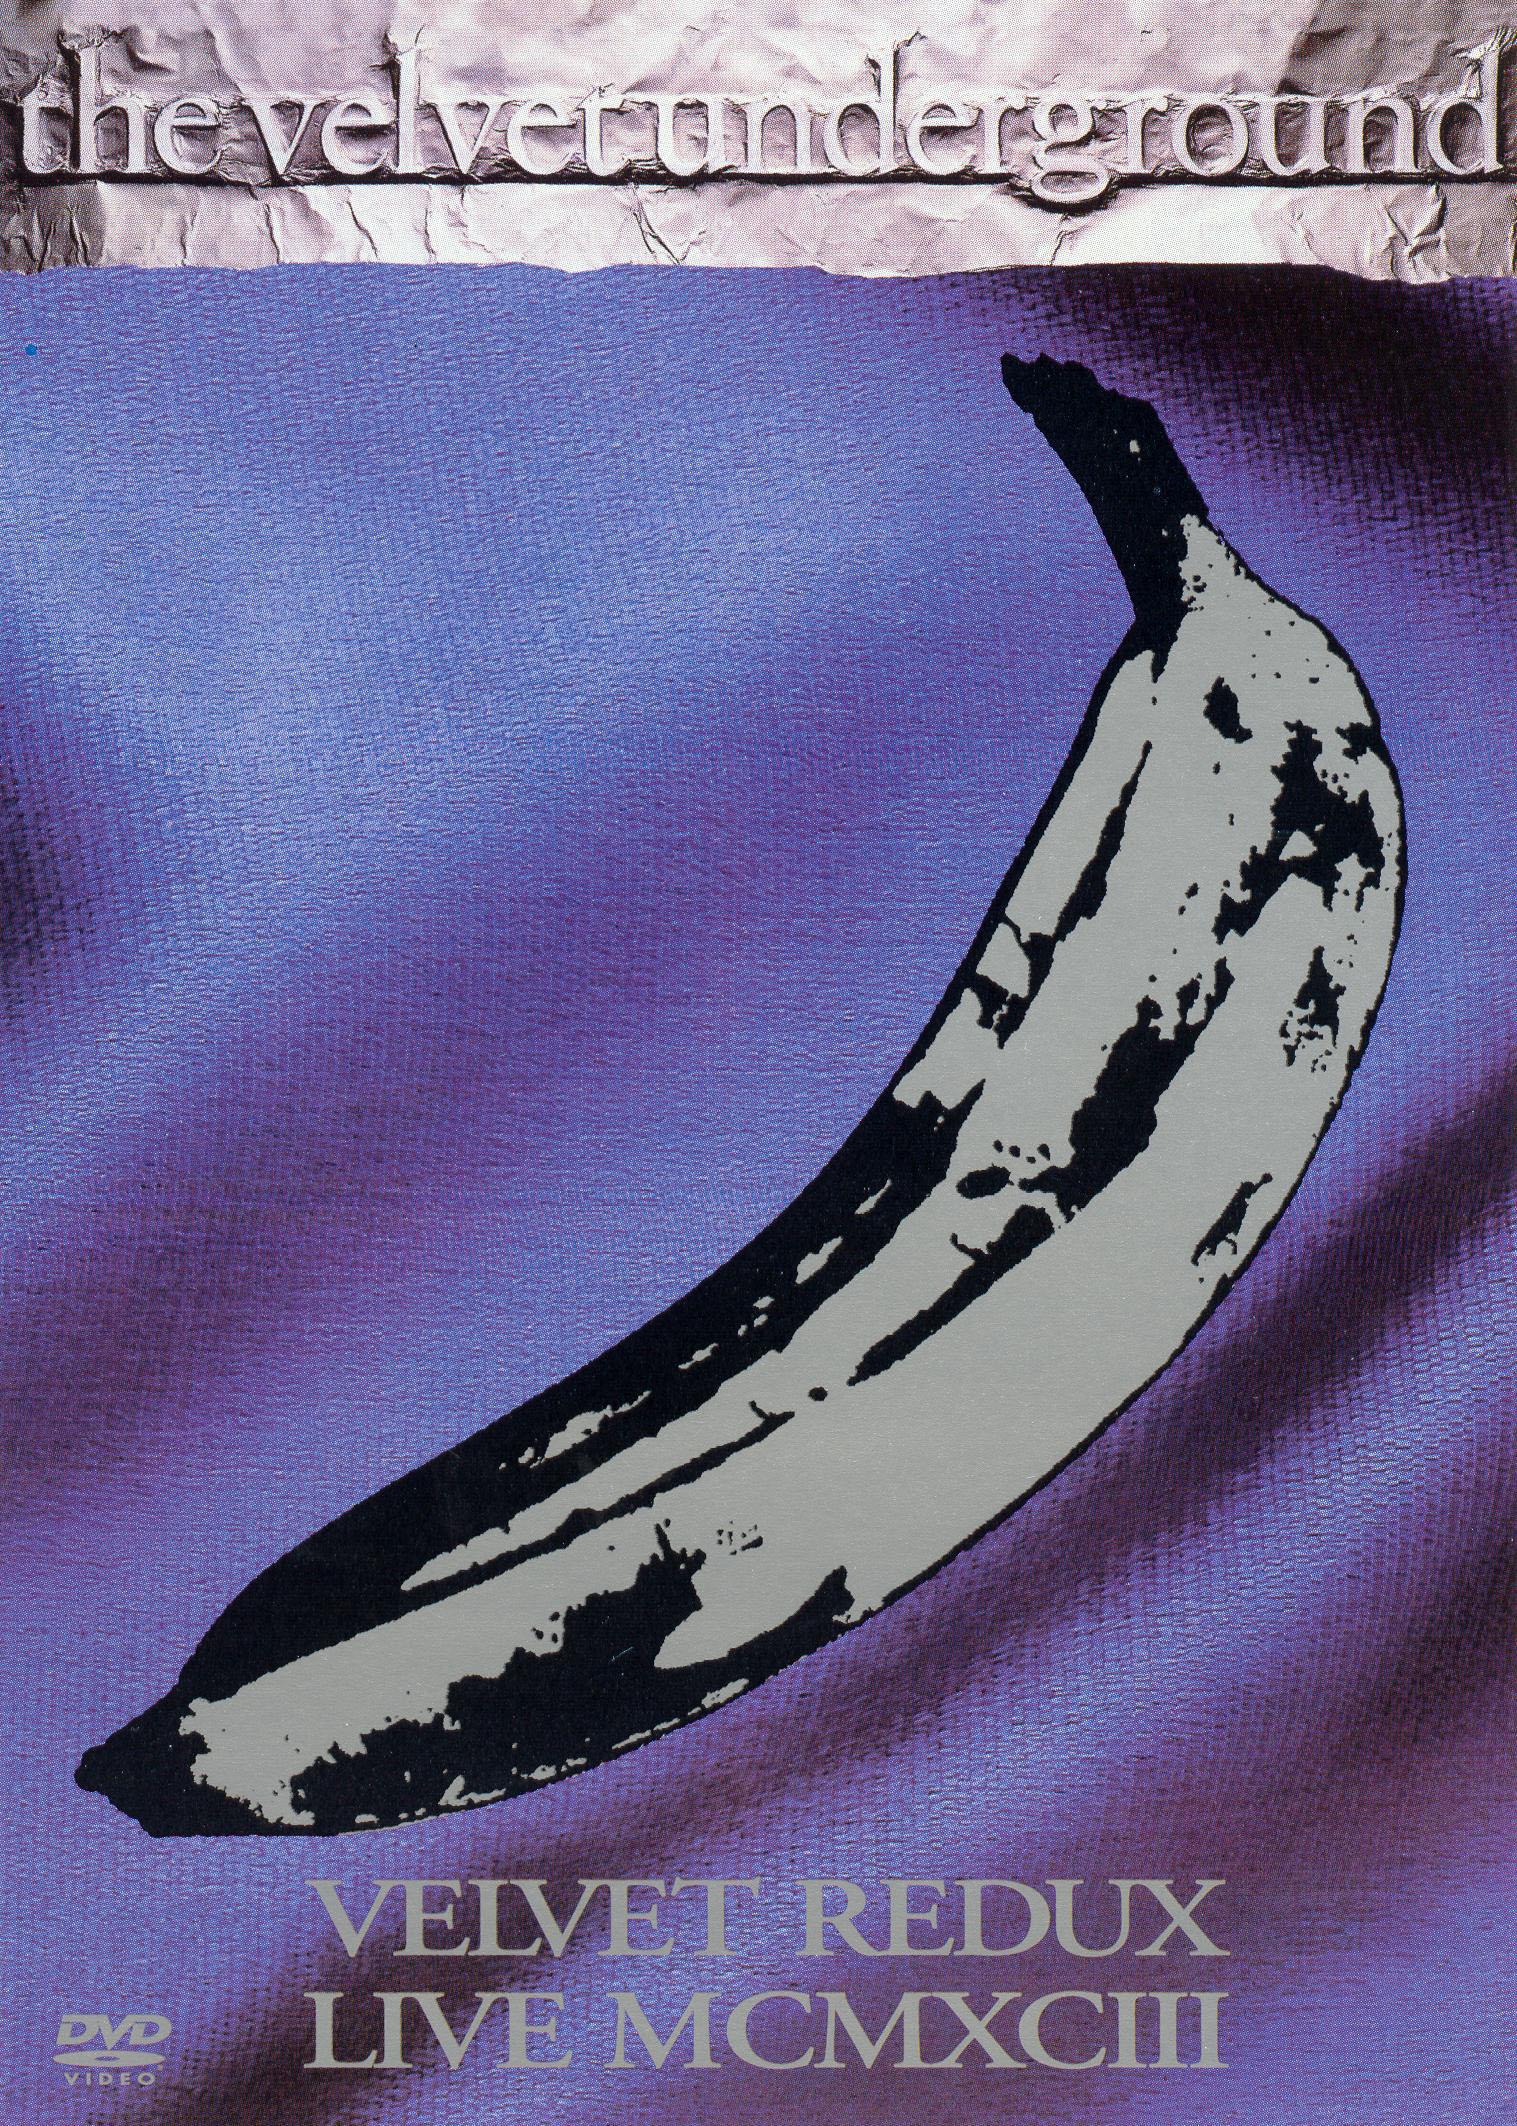 Velvet Underground: Velvet Redux, Live MCMXCIII